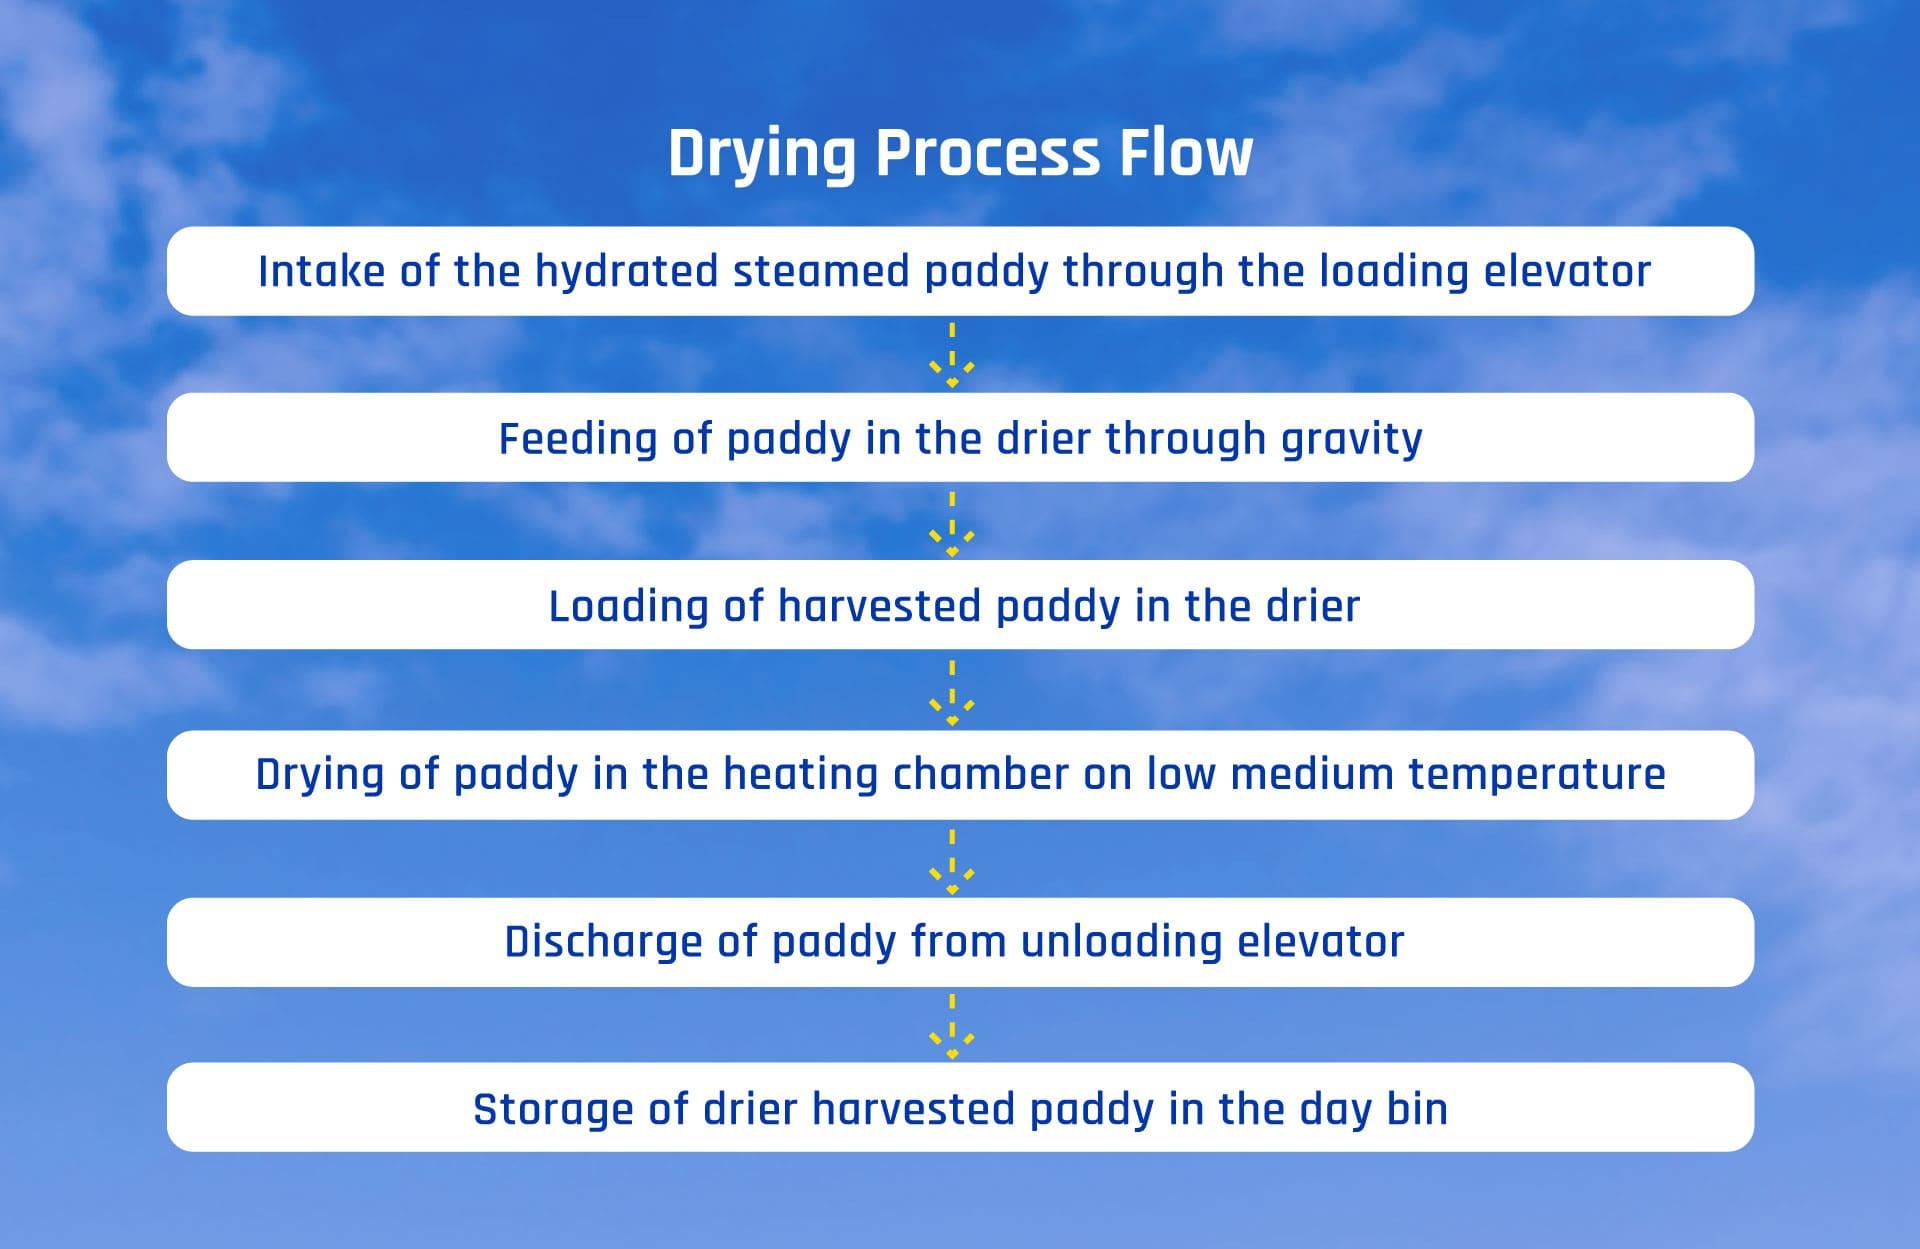 Drying